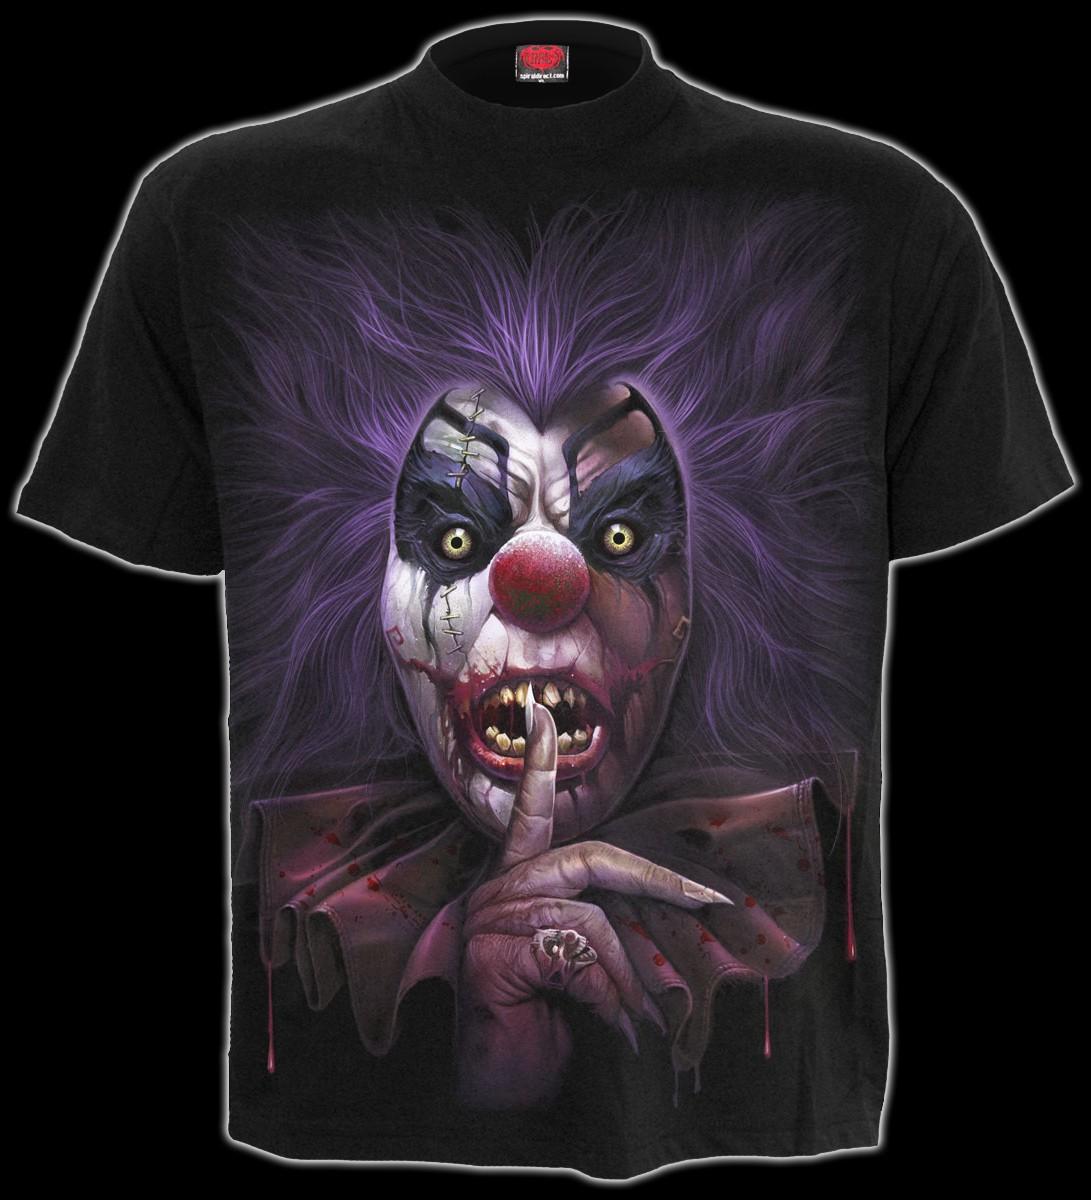 T-Shirt Horror Clown - Madcap